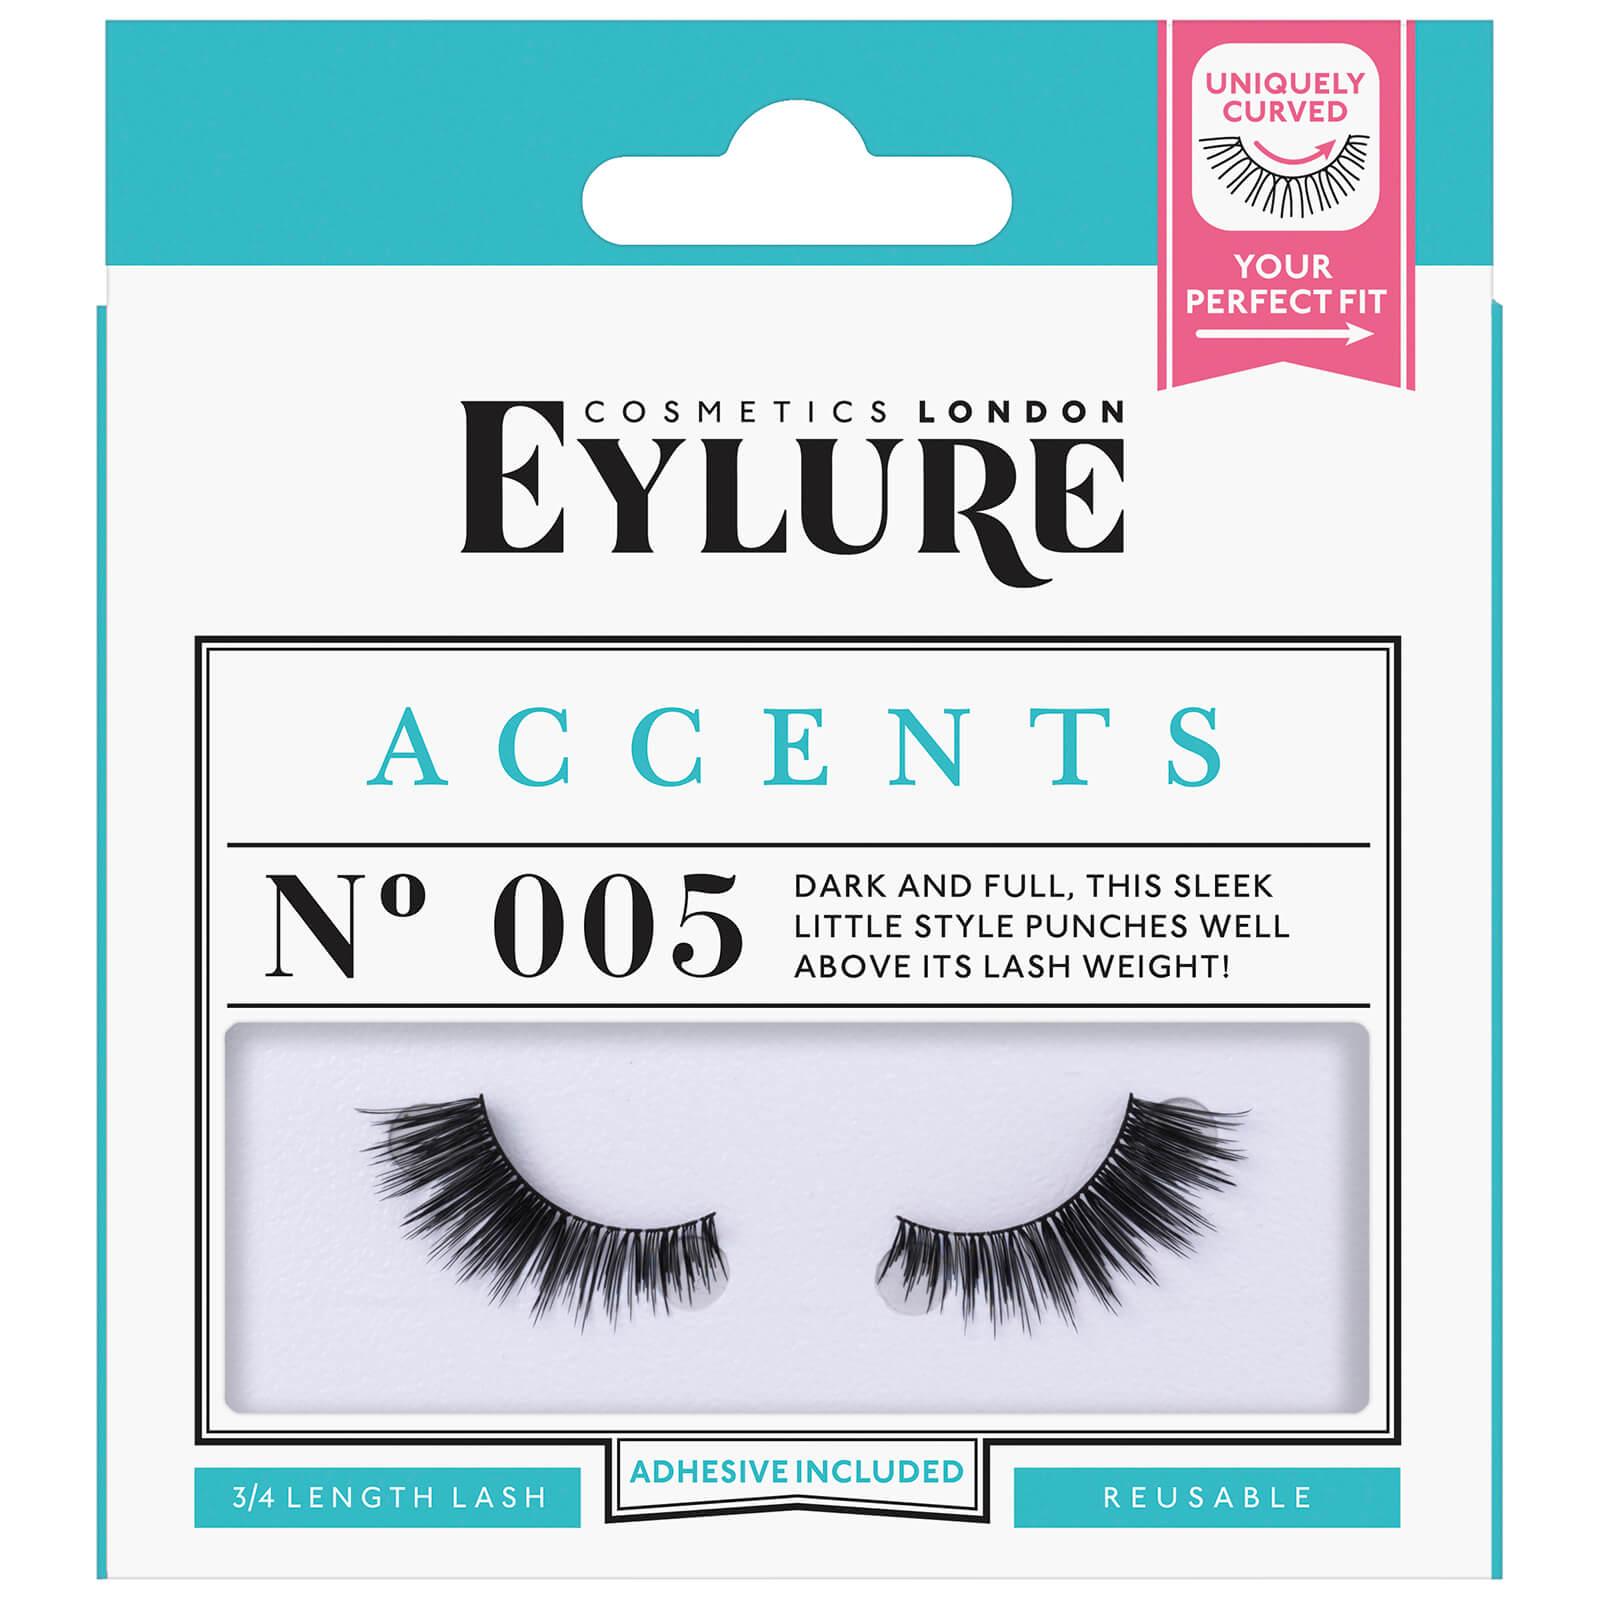 e53586f2ee0 Eylure Accent No.005 Eyelashes | Free Shipping | Lookfantastic